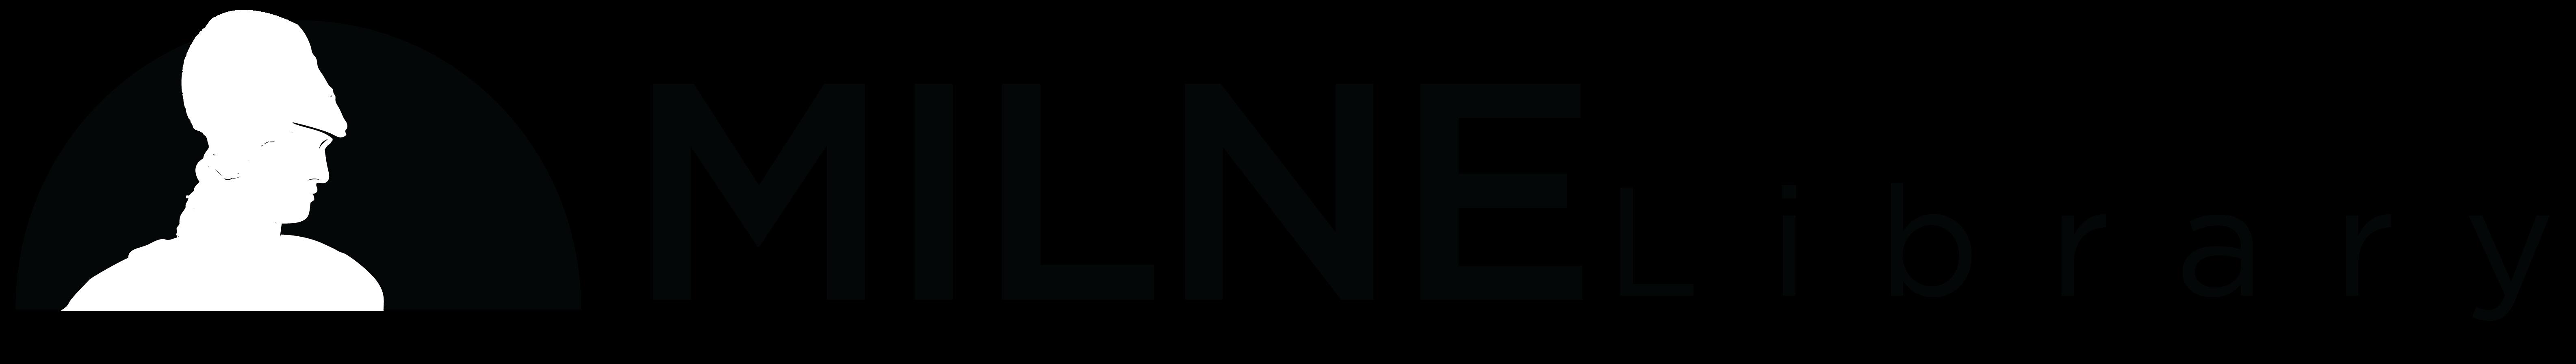 Logo for Milne Publishing